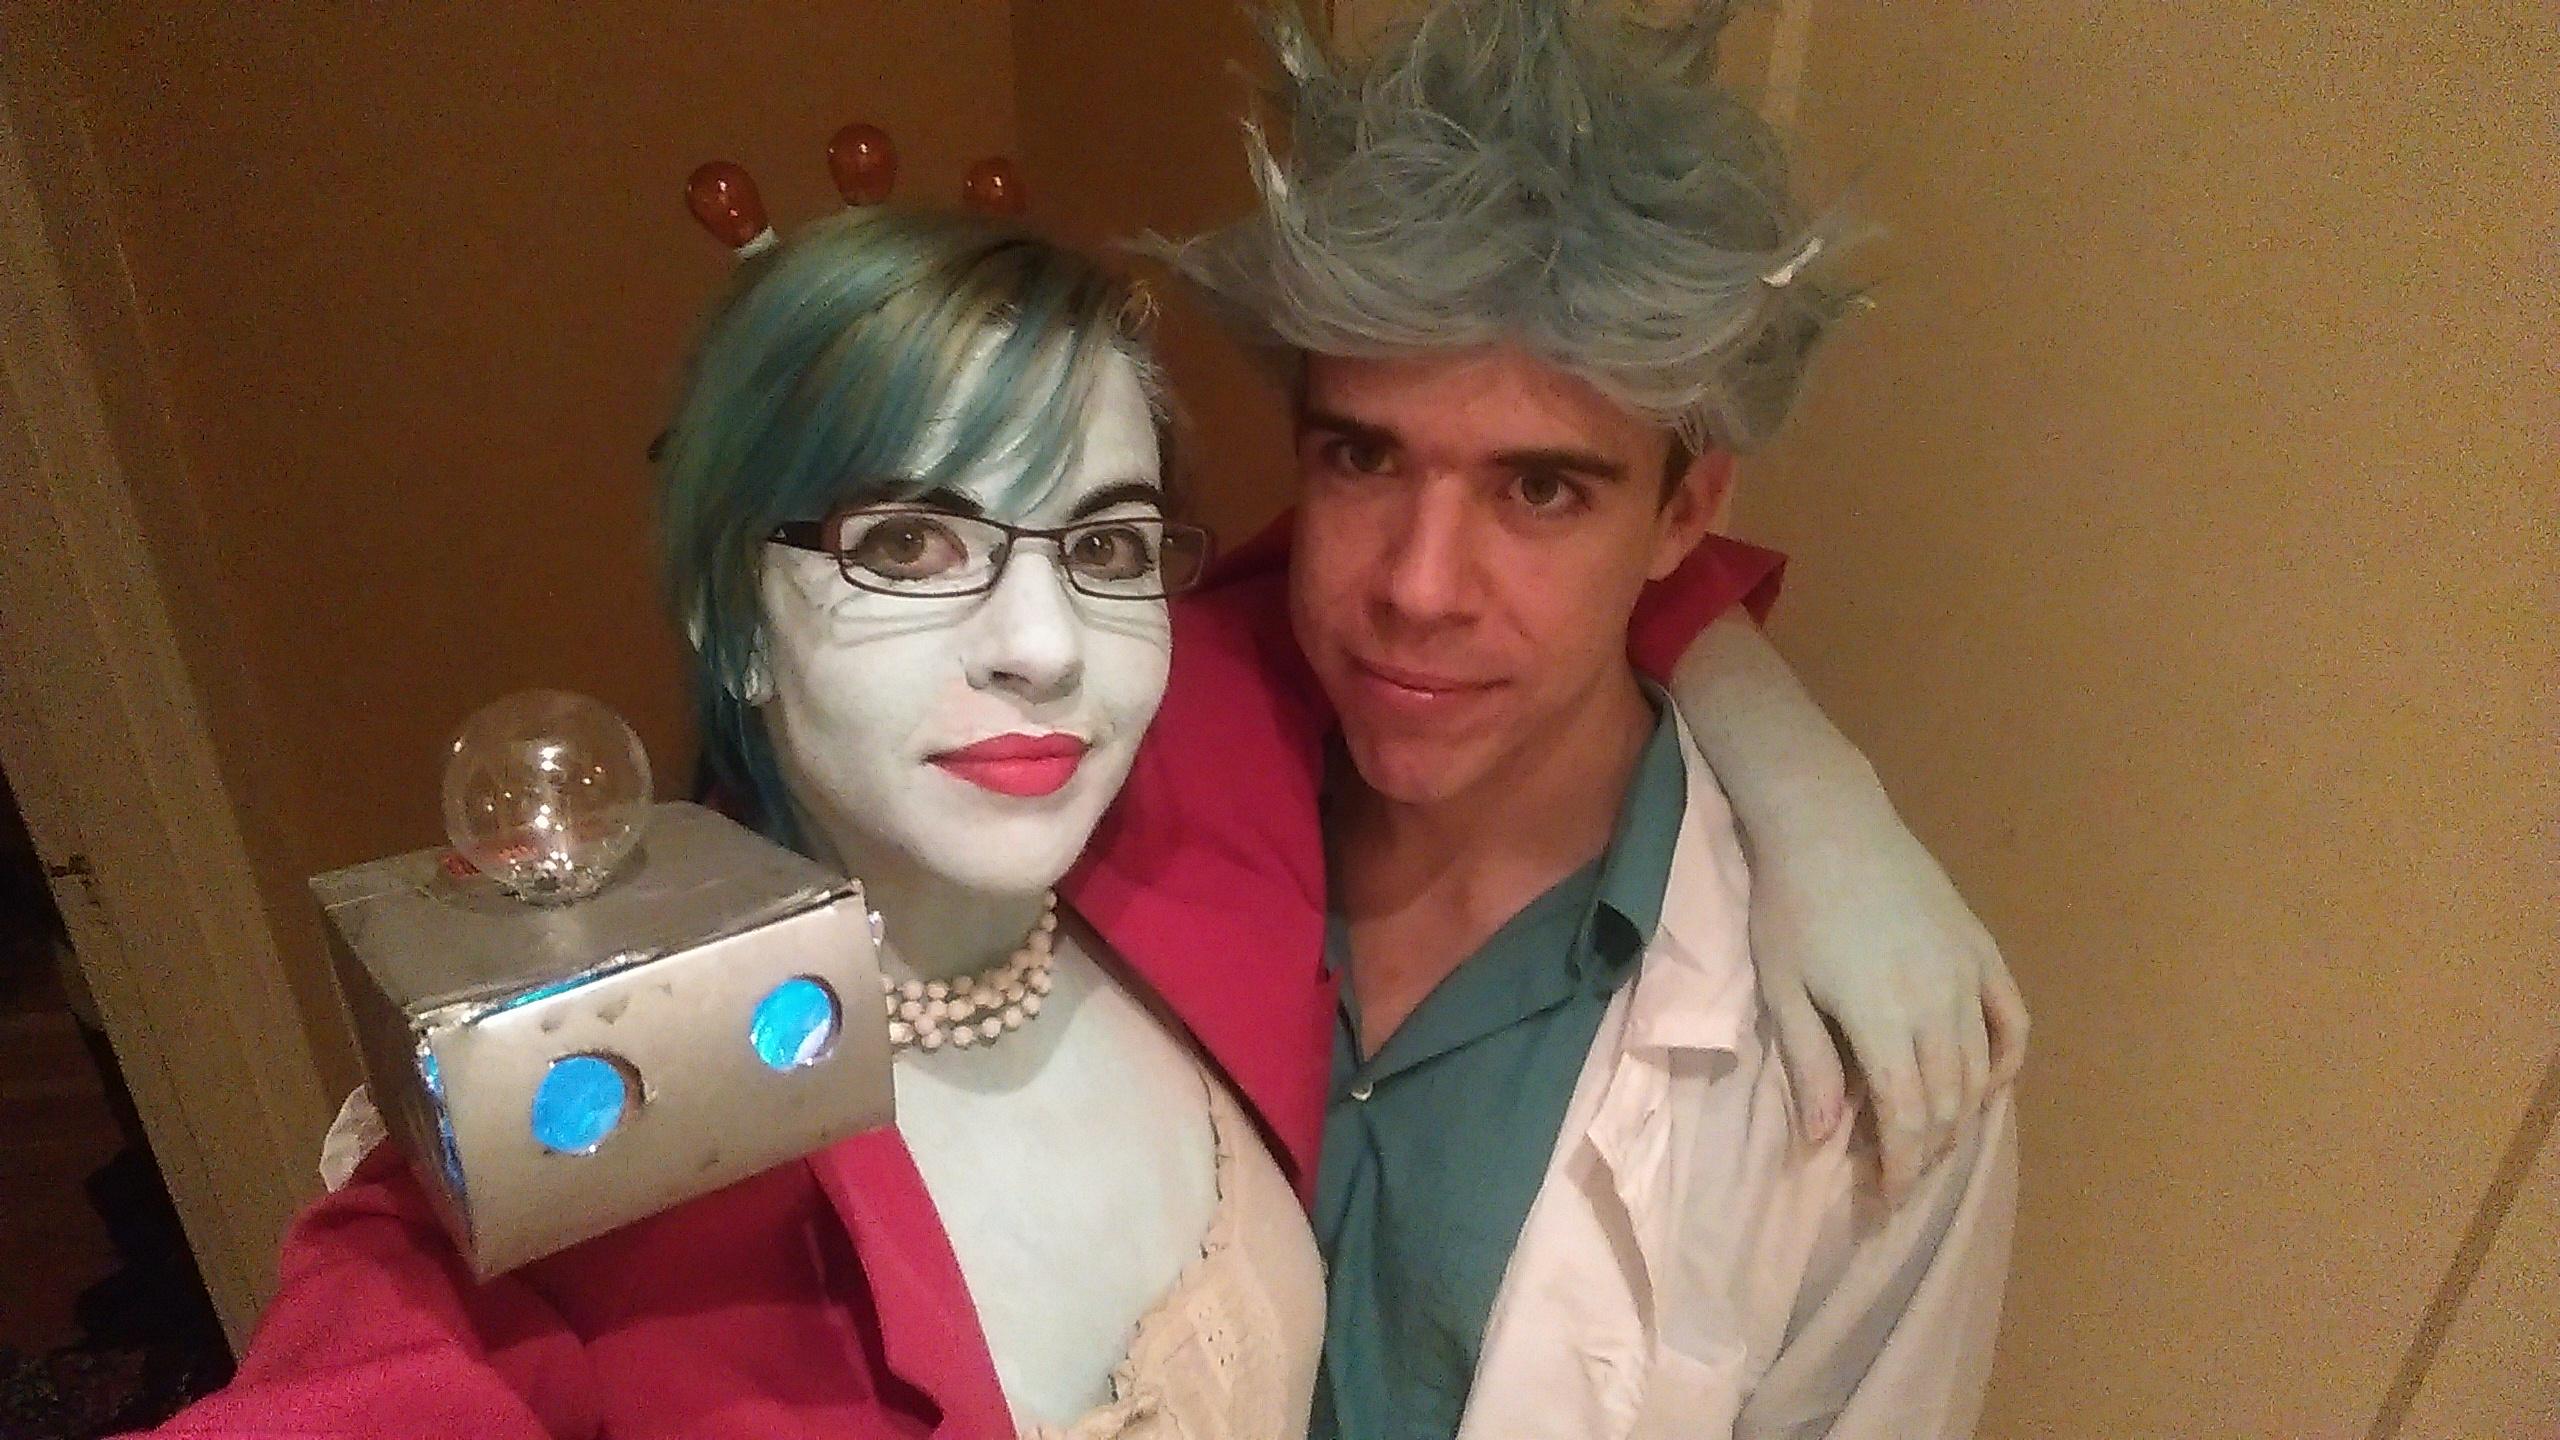 The Best Costumes of Halloween '15 - Wow Gallery | eBaum's World